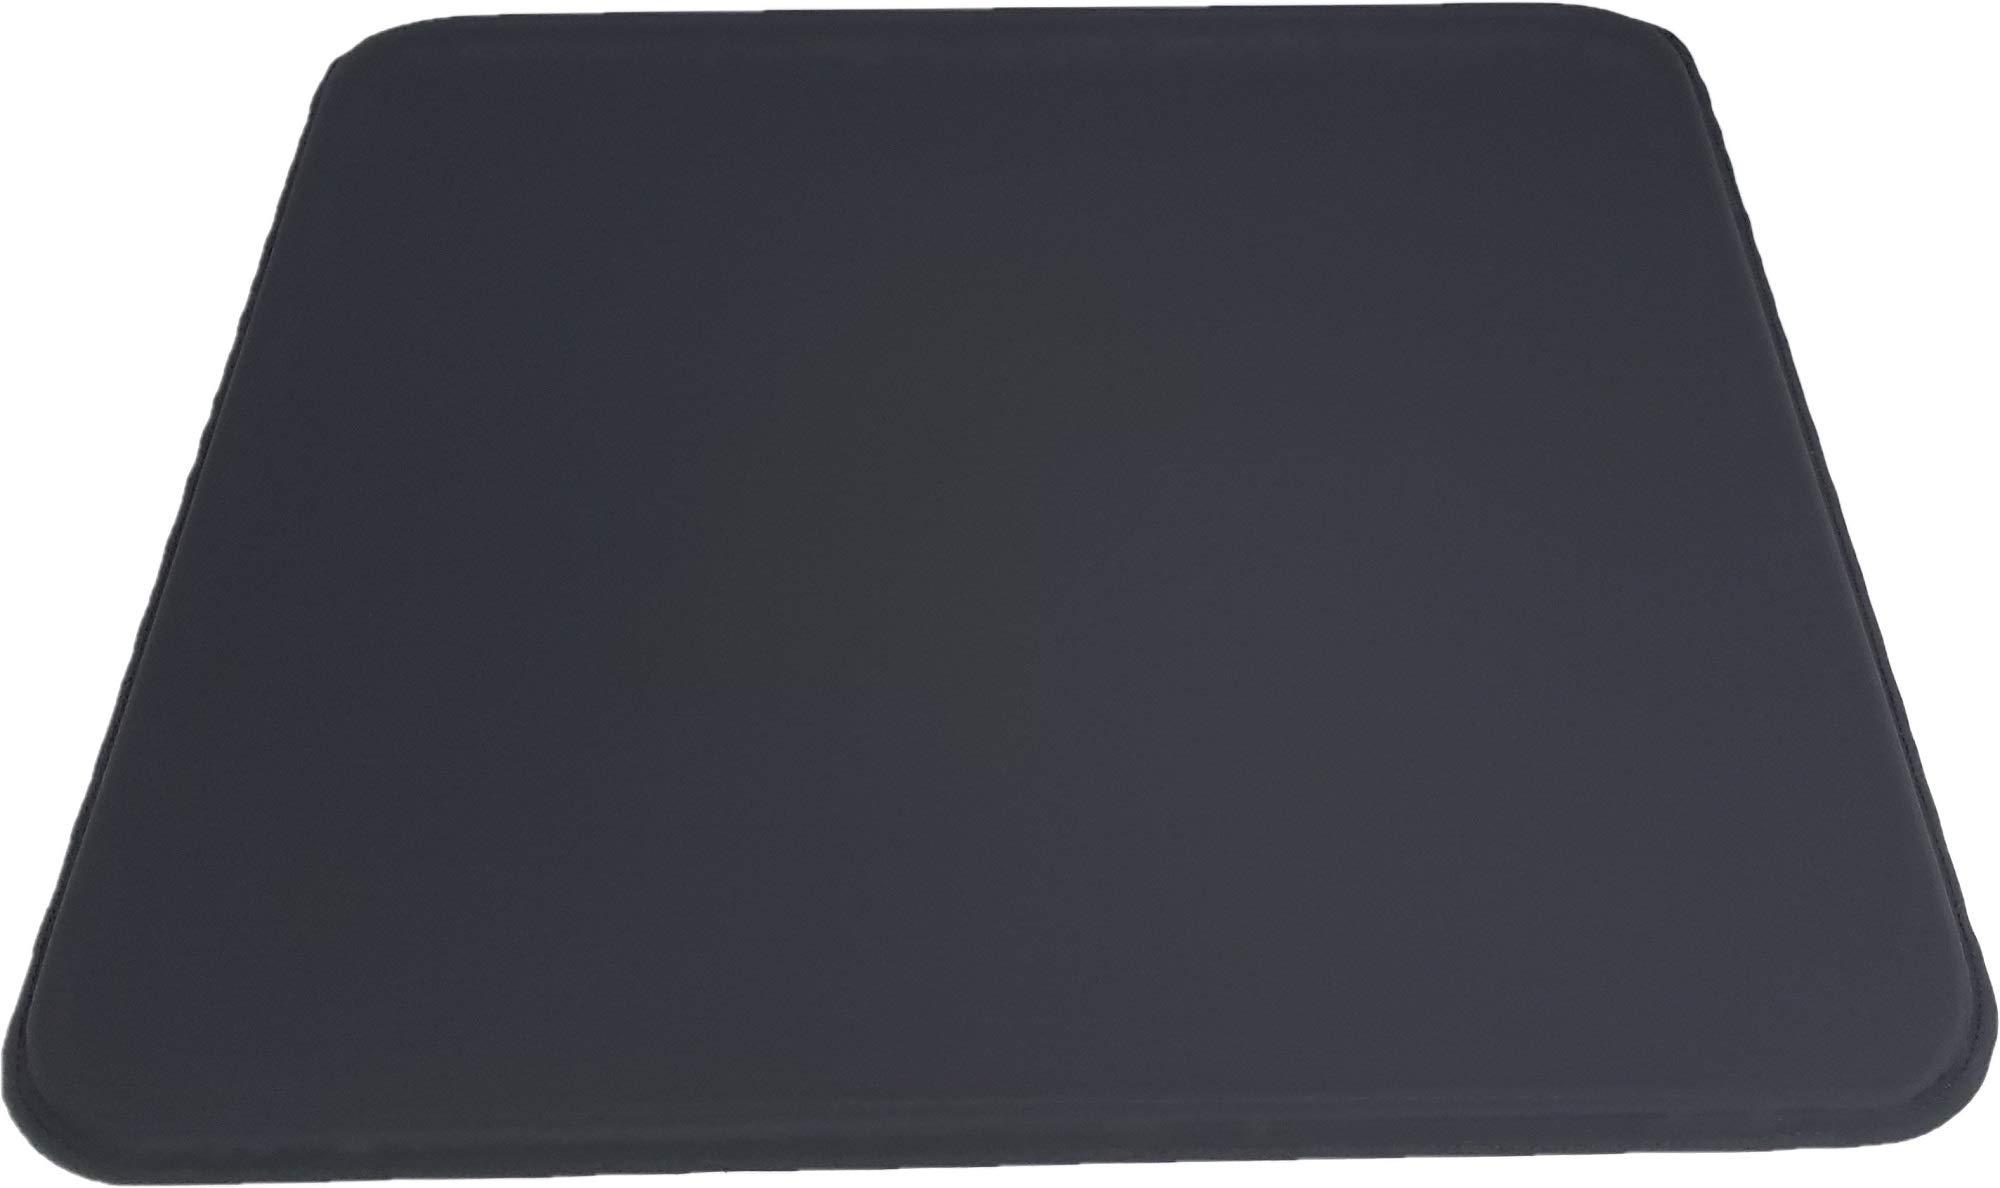 ULTRAGEL Anywhere, Anytime Personal Comfort Gel Pad-SG (Soft Gel) (16.5x18.5, Black/Non-Slip) by ULTRAGEL